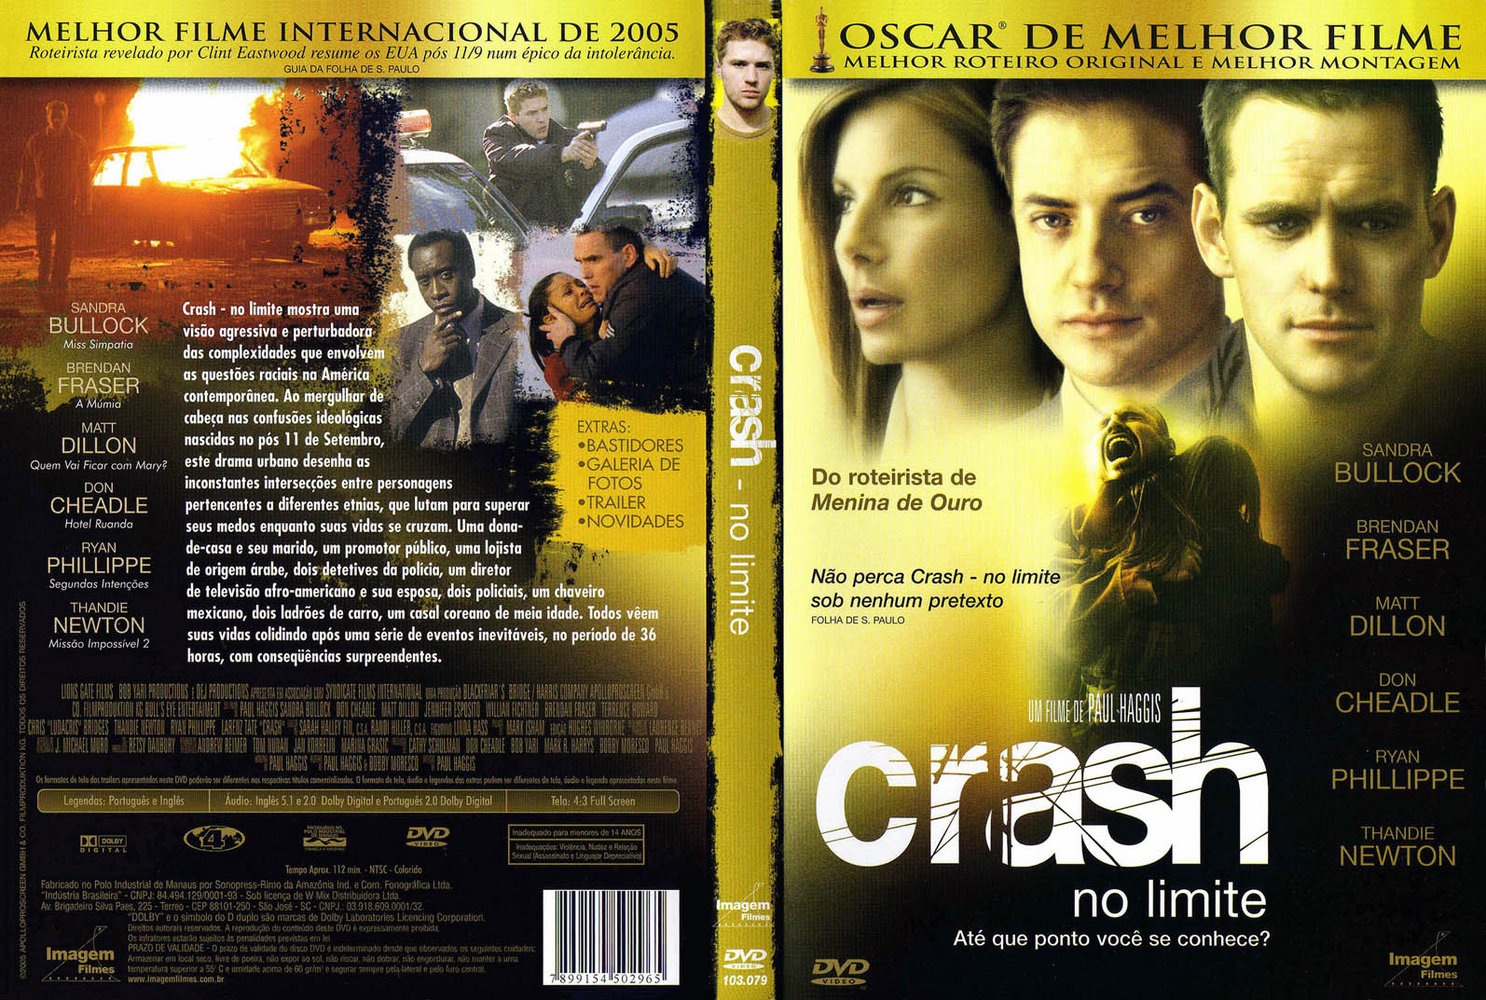 http://3.bp.blogspot.com/_S7Uj0sr4Ito/S8njSn7BP6I/AAAAAAAACKQ/99BghIrdhIY/s1600/Crash+-+No+Limite.jpg